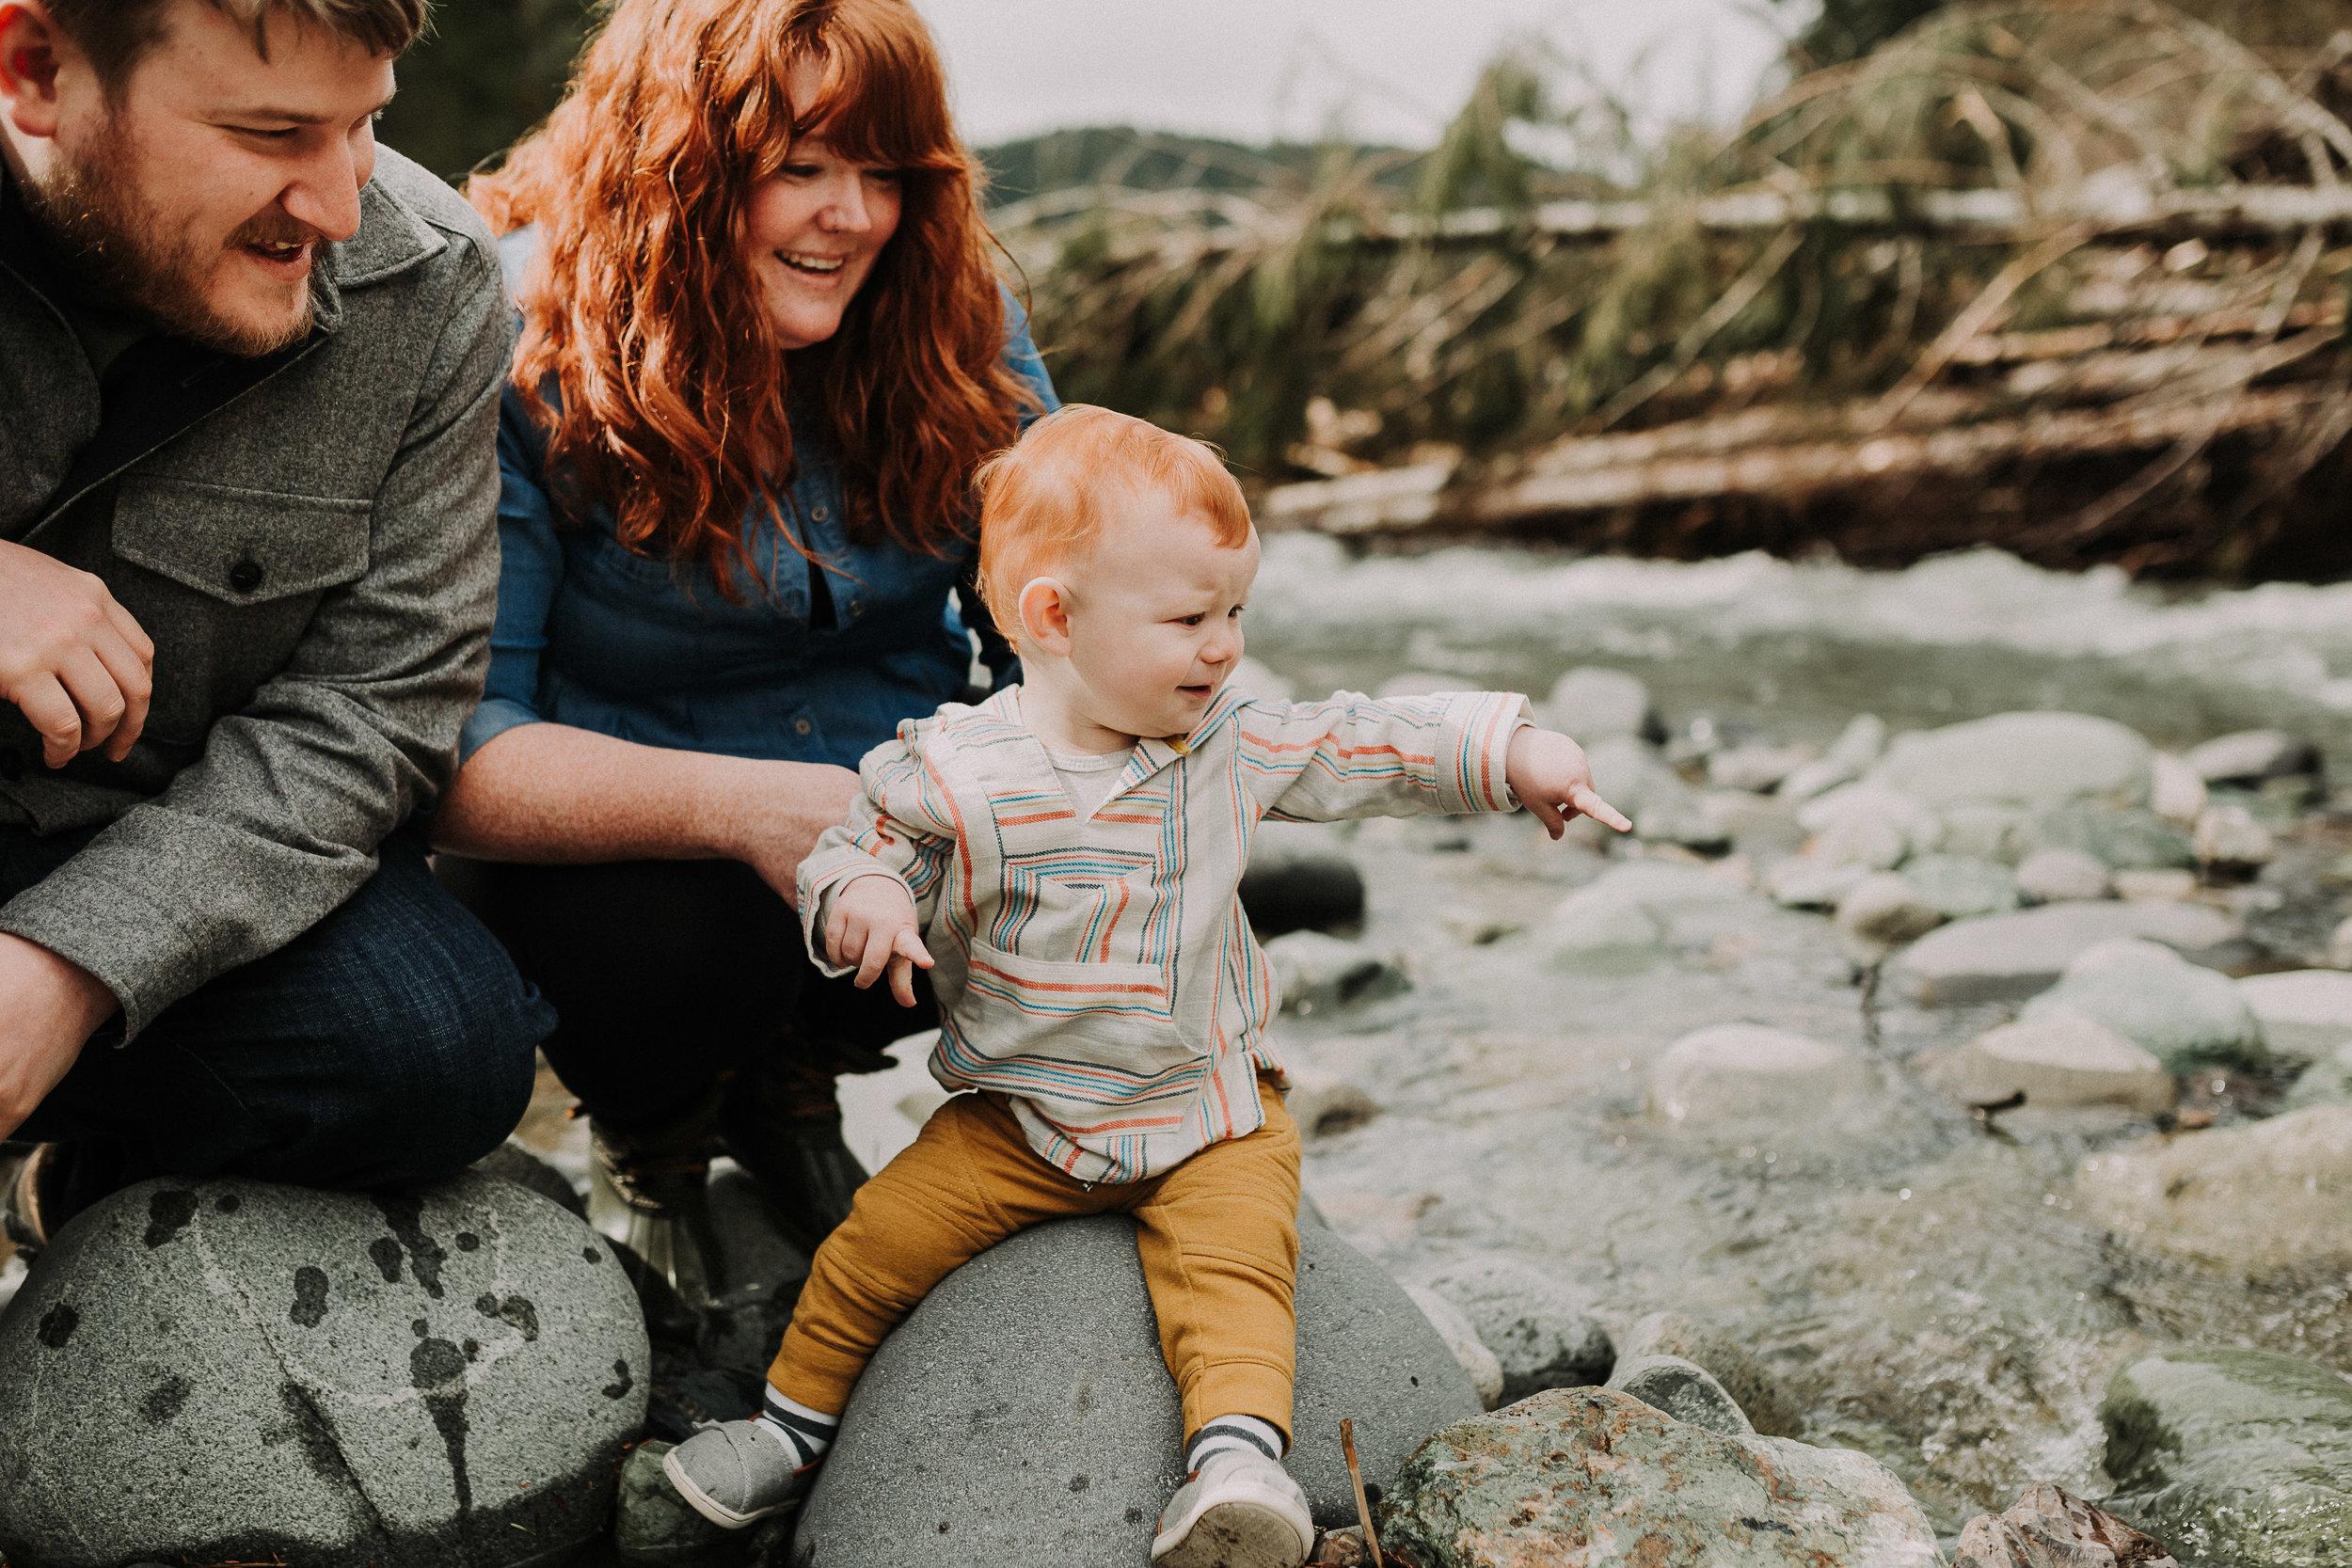 Family-Photographer-Bellingham-WA-Brianne-Bell-Photography-(Sam)